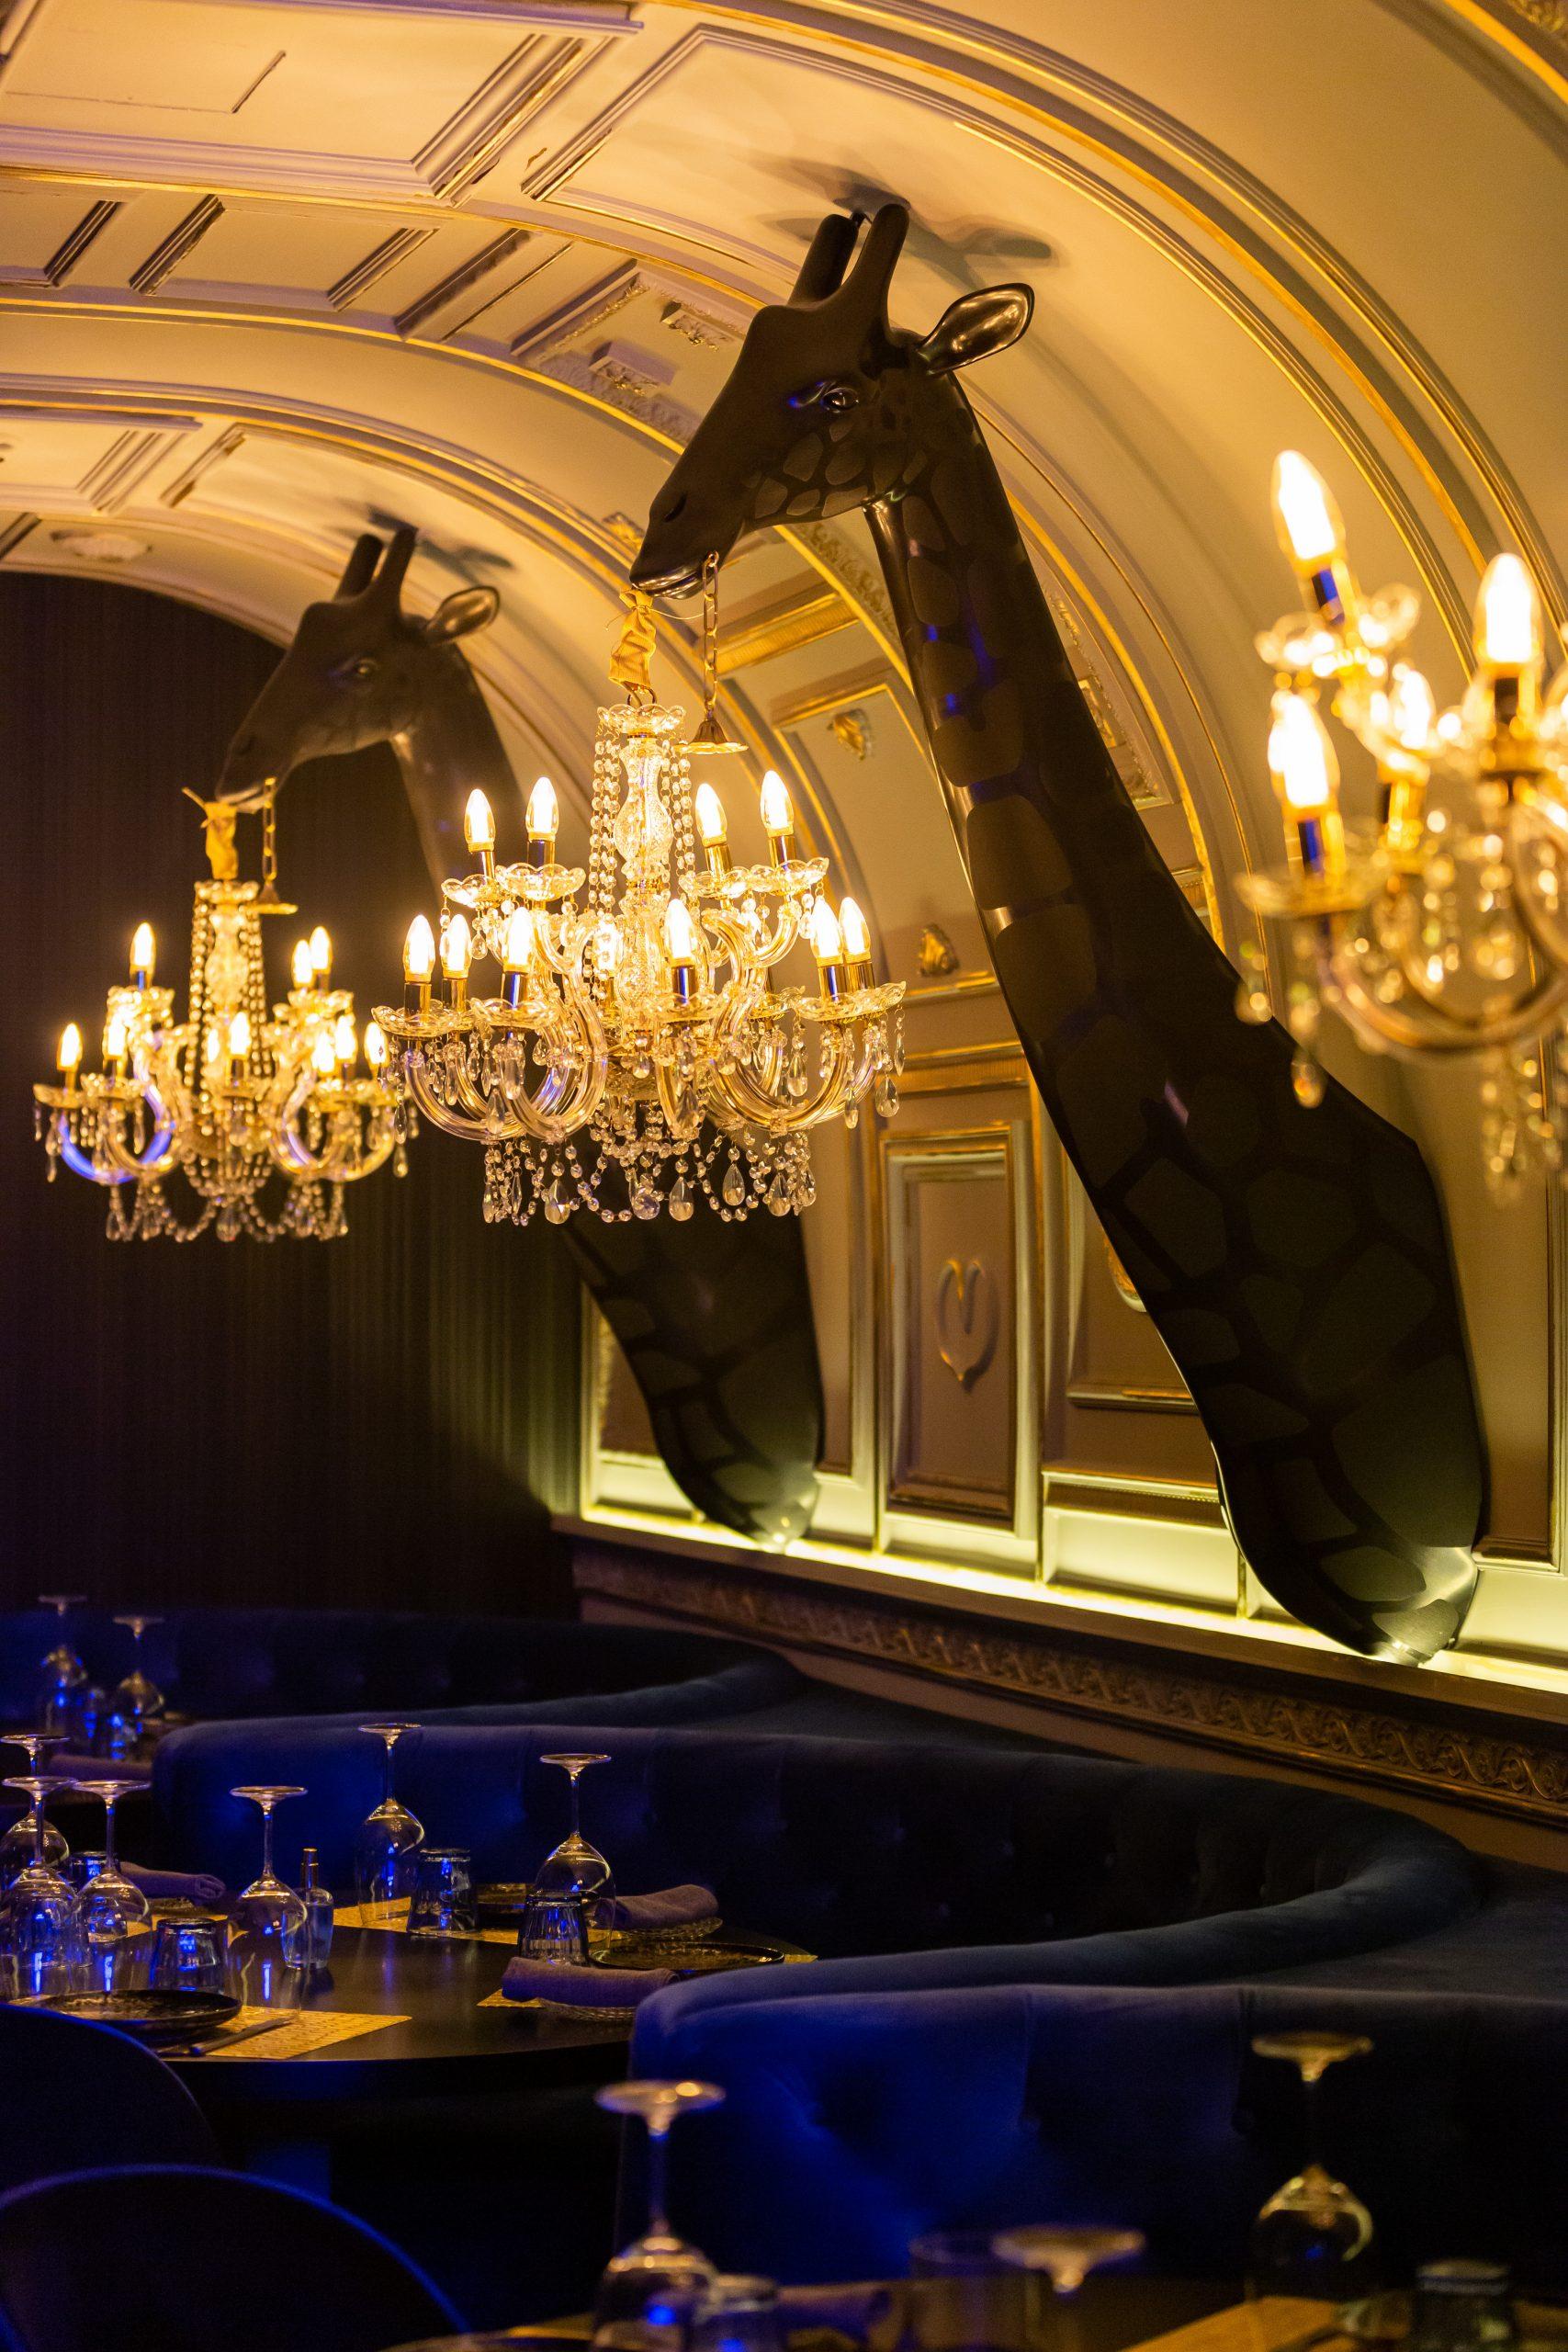 Detalles del interior del restaurante / Foto: Aurora Madrid